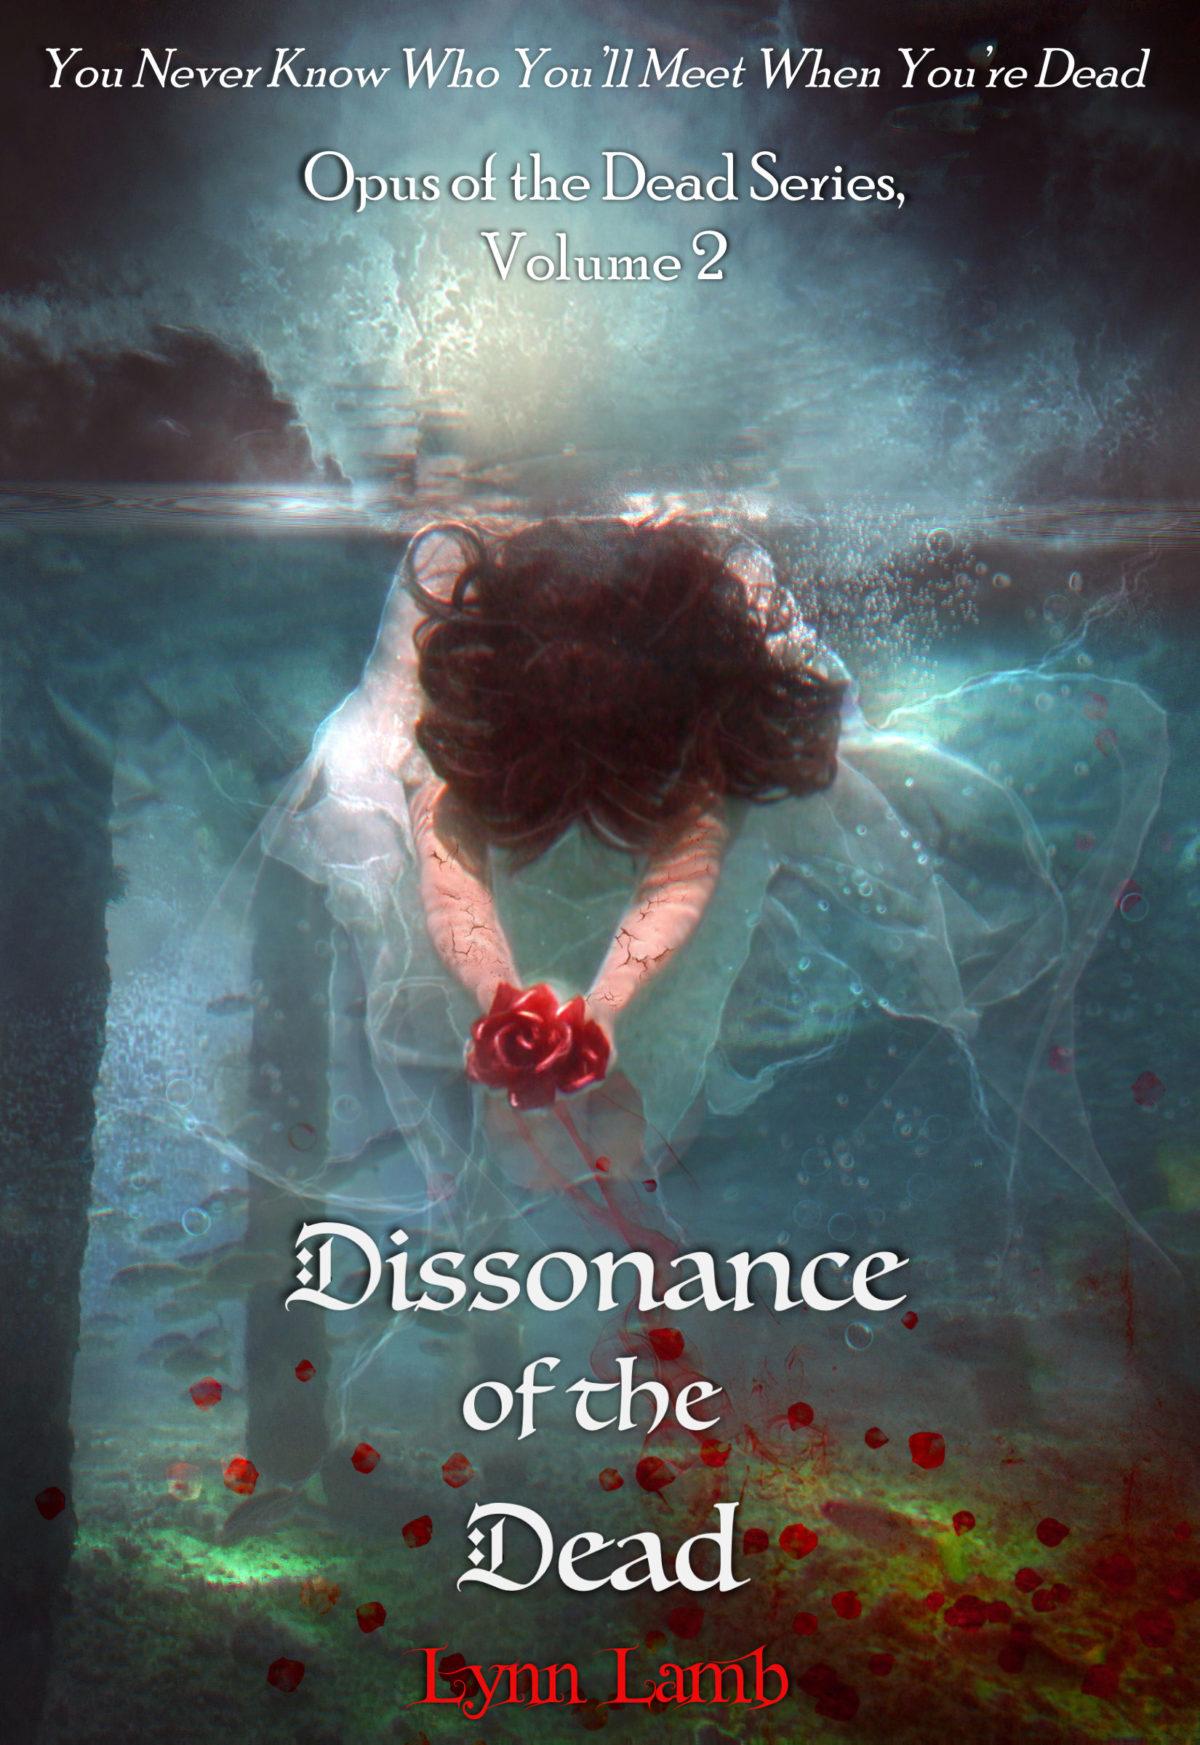 Lynn Lamb's Dissonance of the Dead